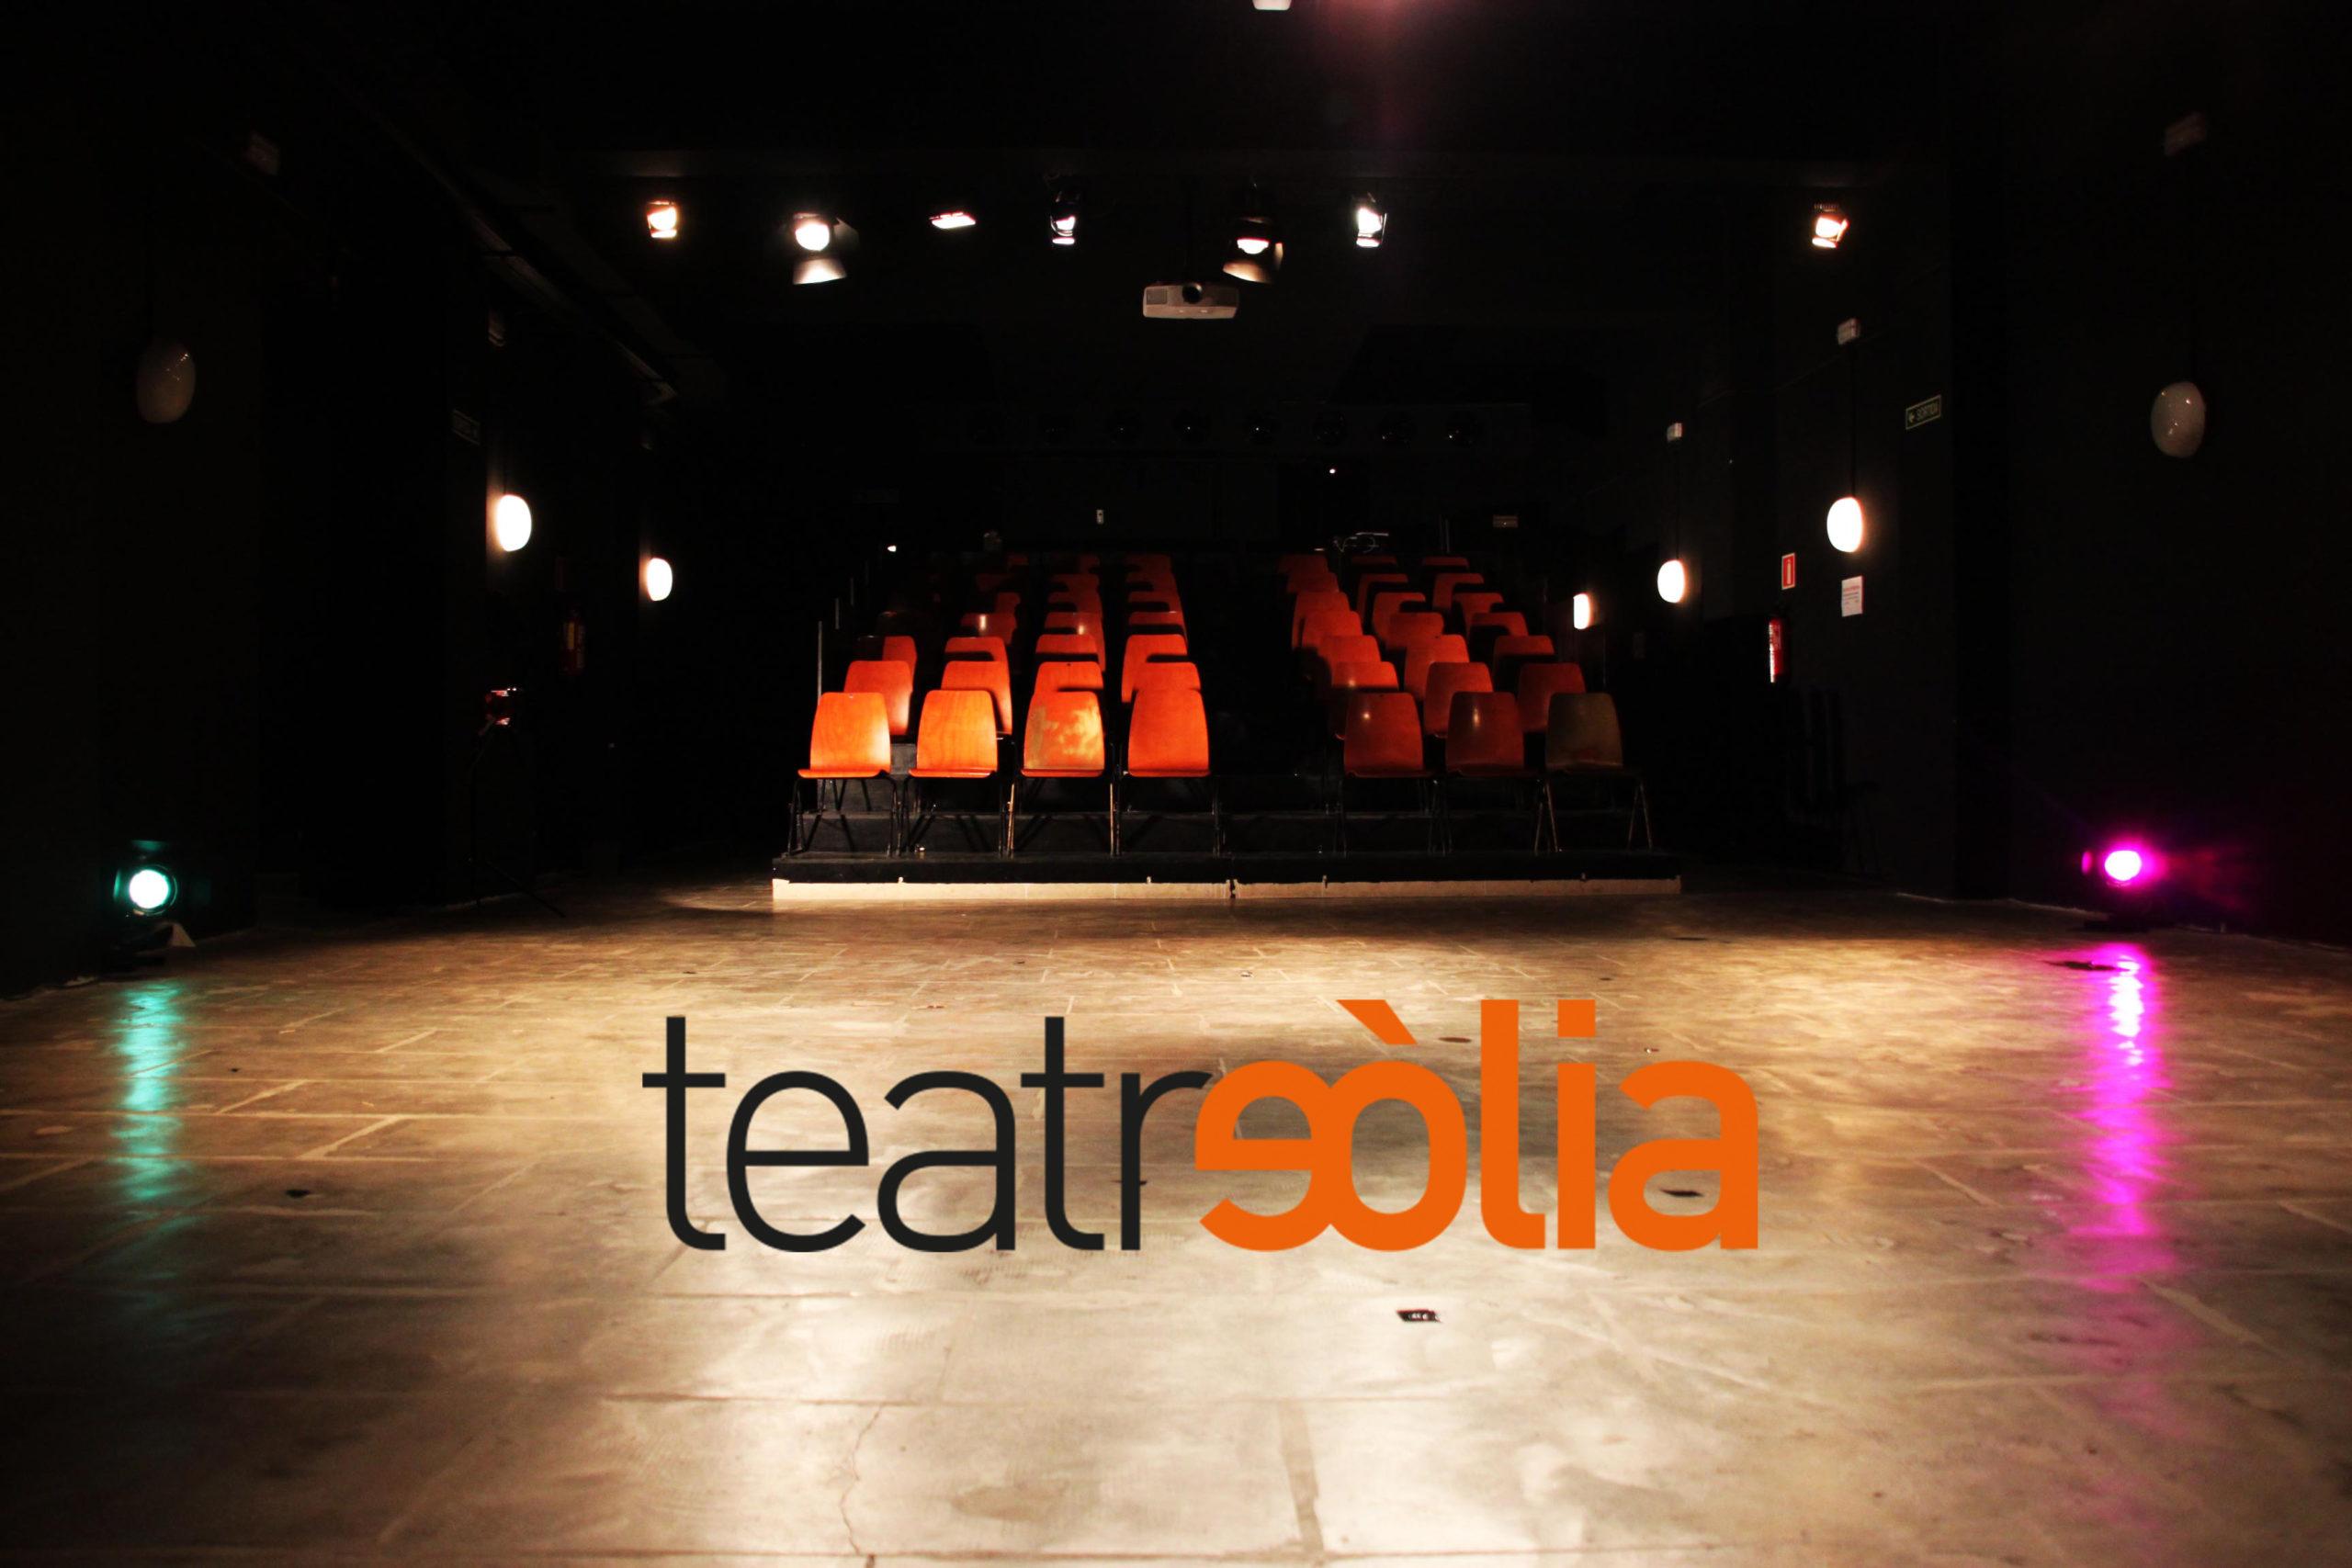 Teatro Eolia en Barcelona